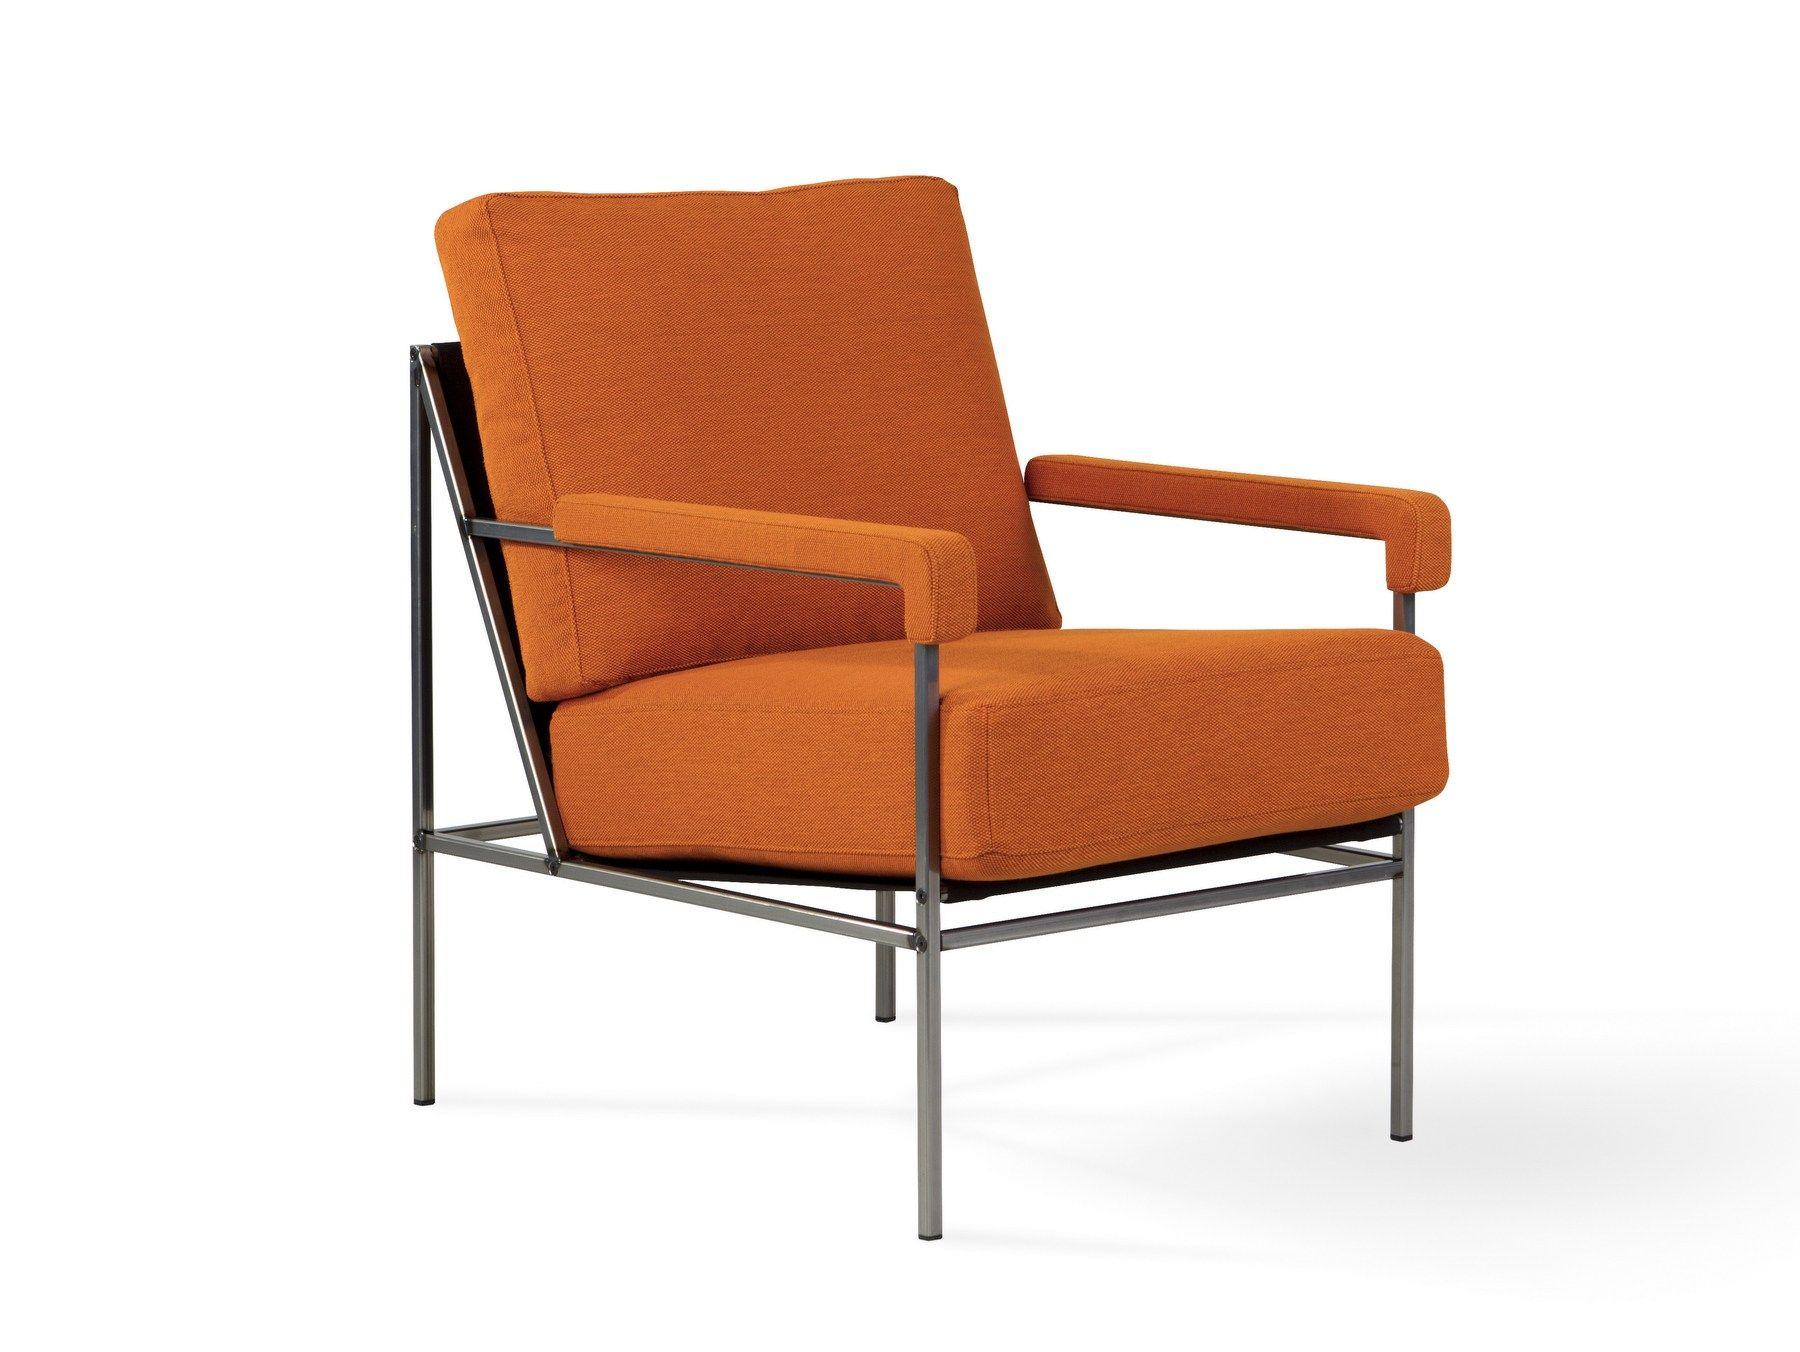 contract furniture from ji jonas ihreborn